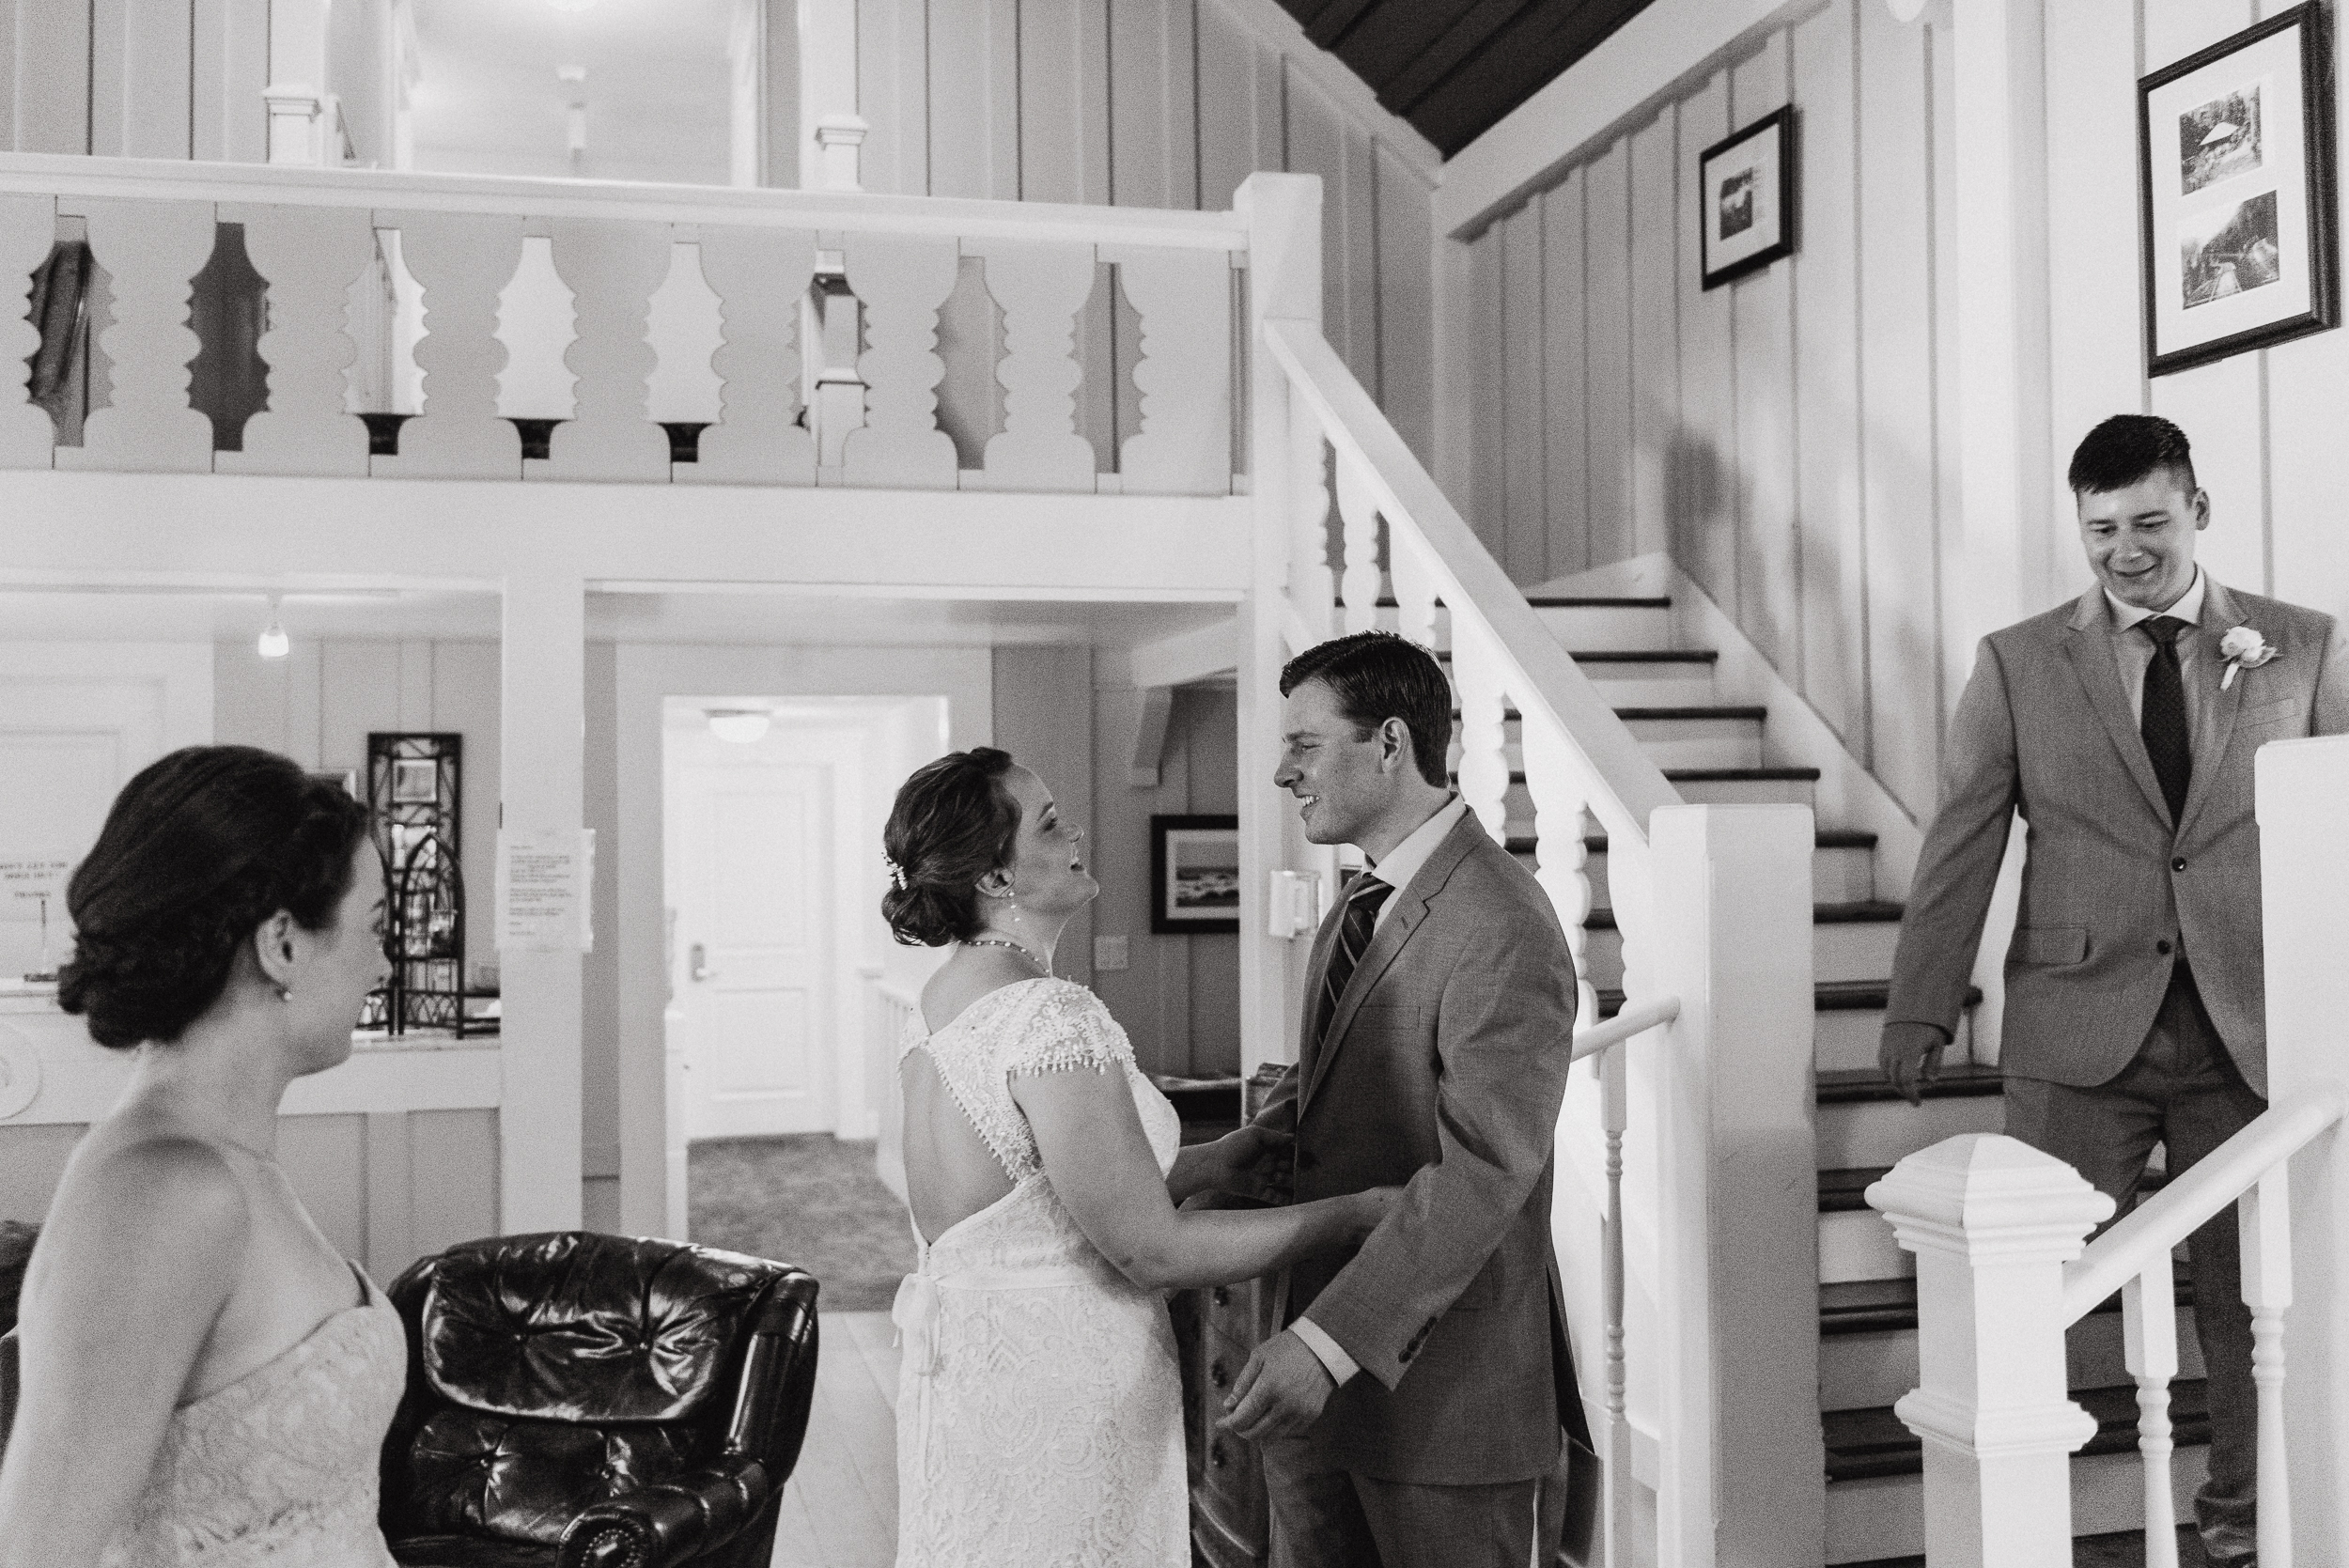 011-highland-dell-lodge-russian-river-wedding-vivianchen-063.jpg